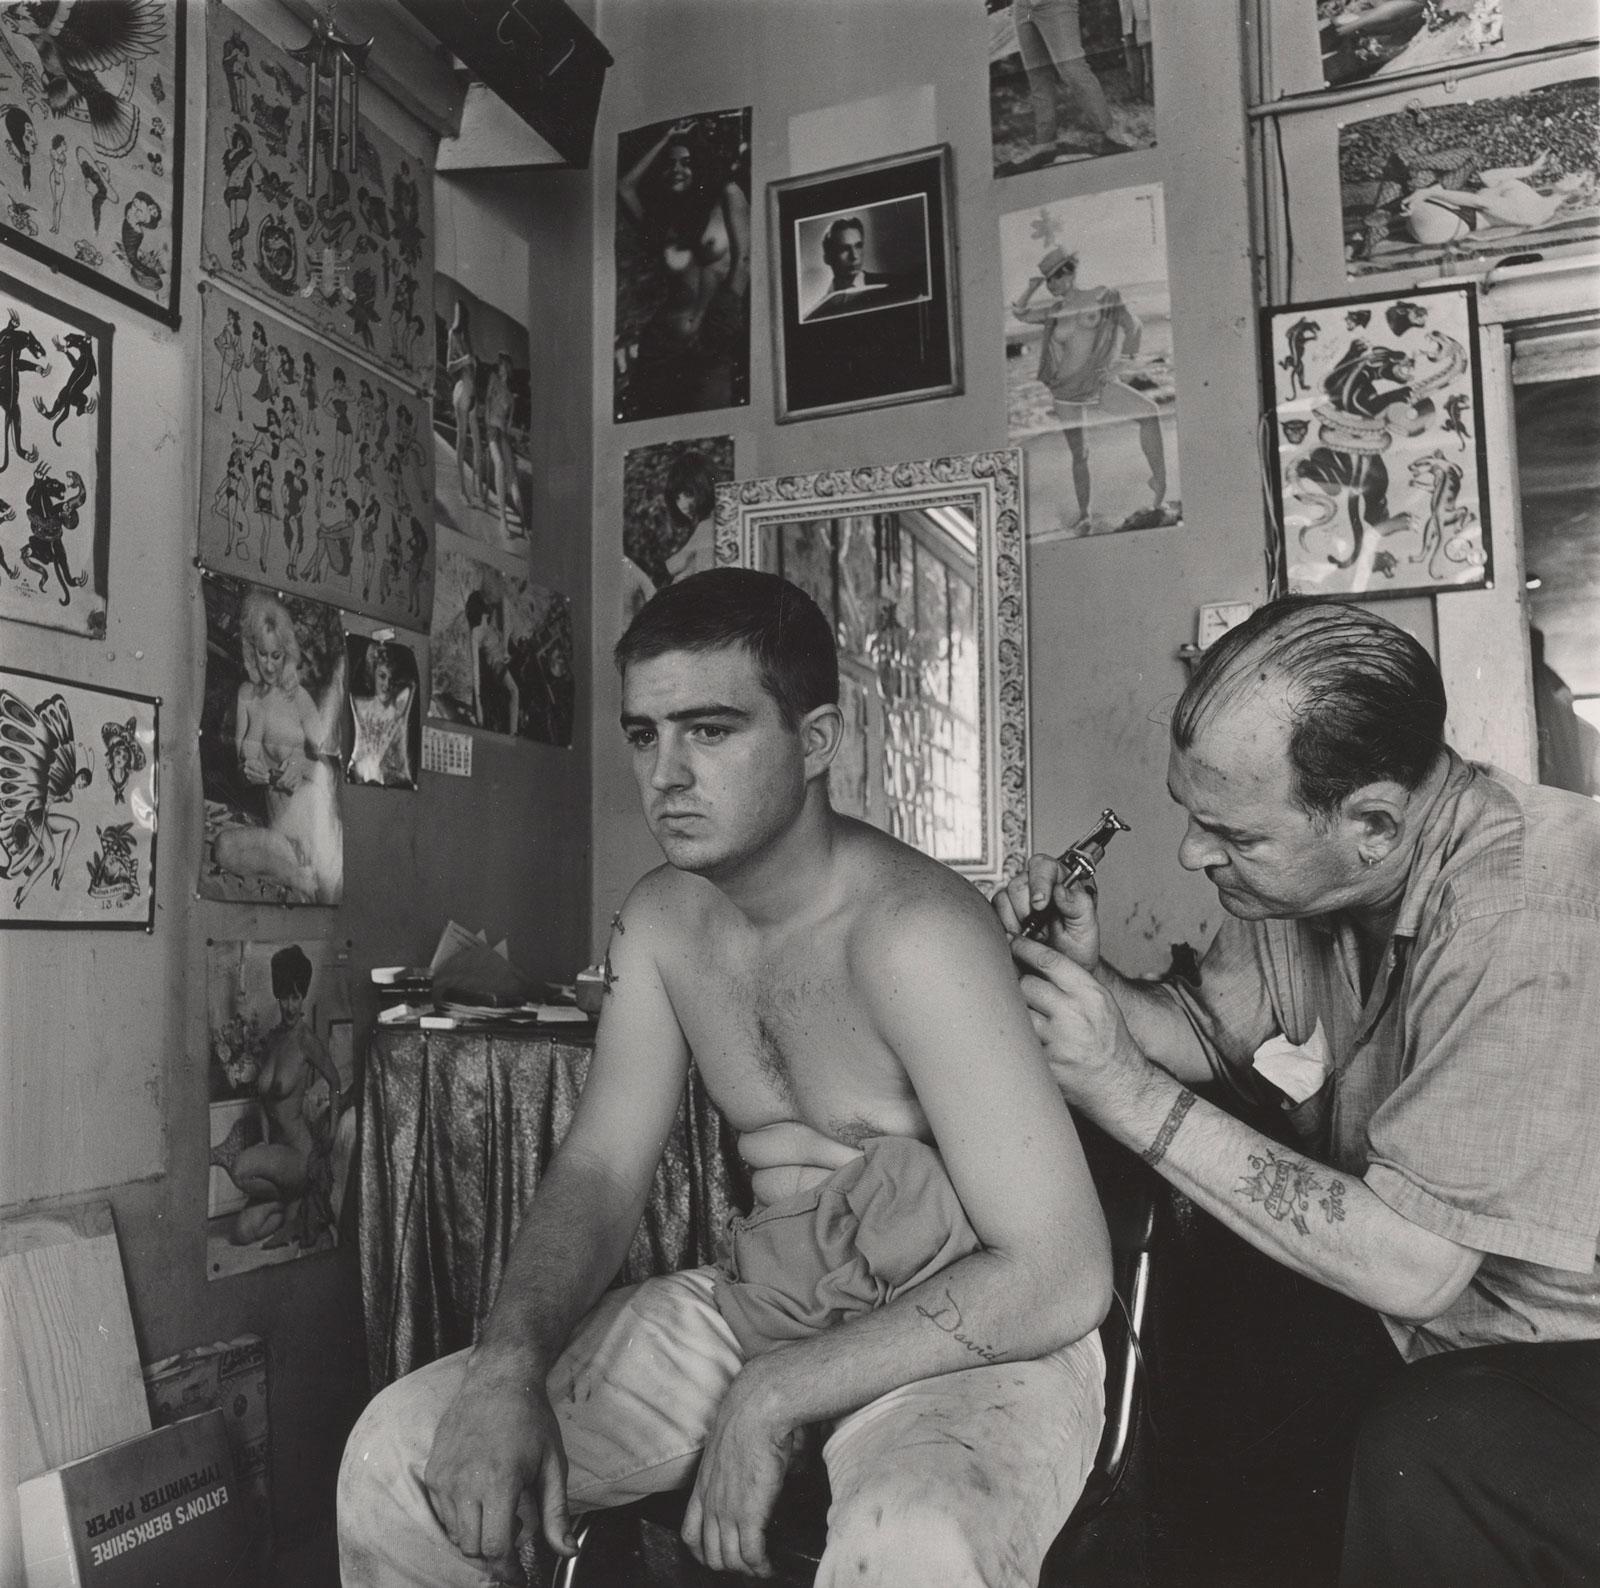 Danny Lyon: Bill Sanders, Tattoo Artist, Houston, Texas, 1968